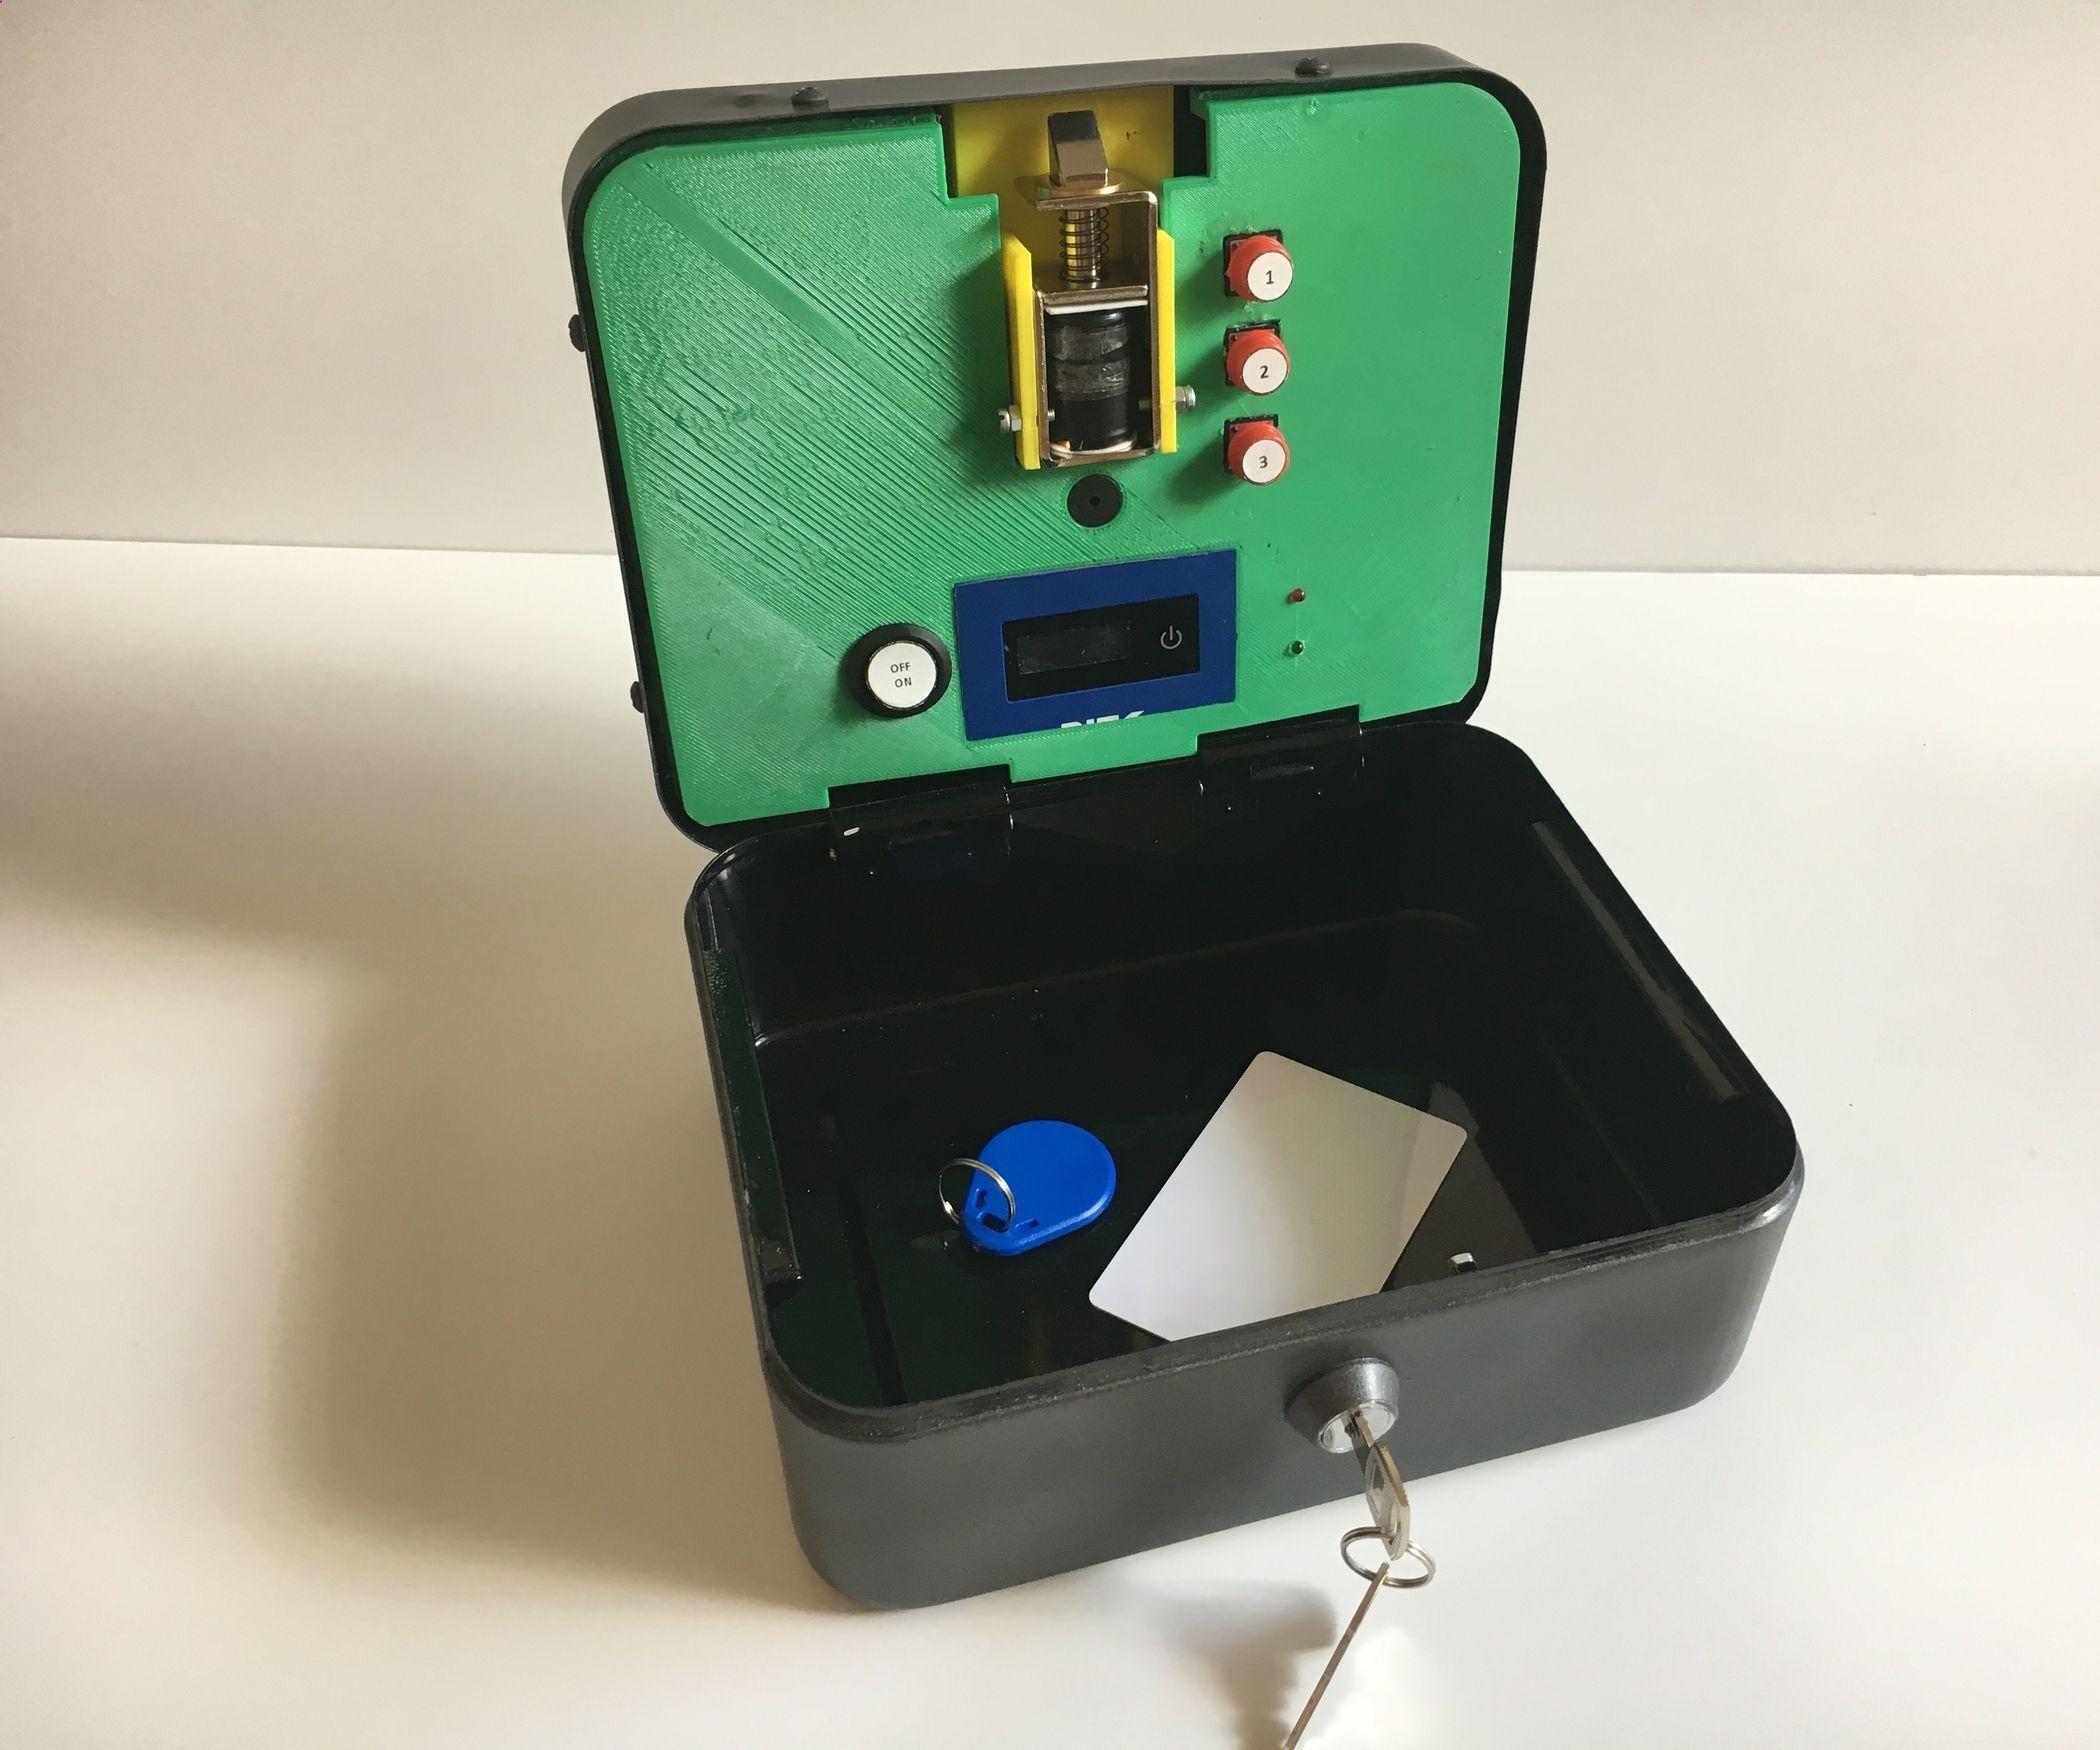 Diy battery reconditioning rfid lockbox save money and